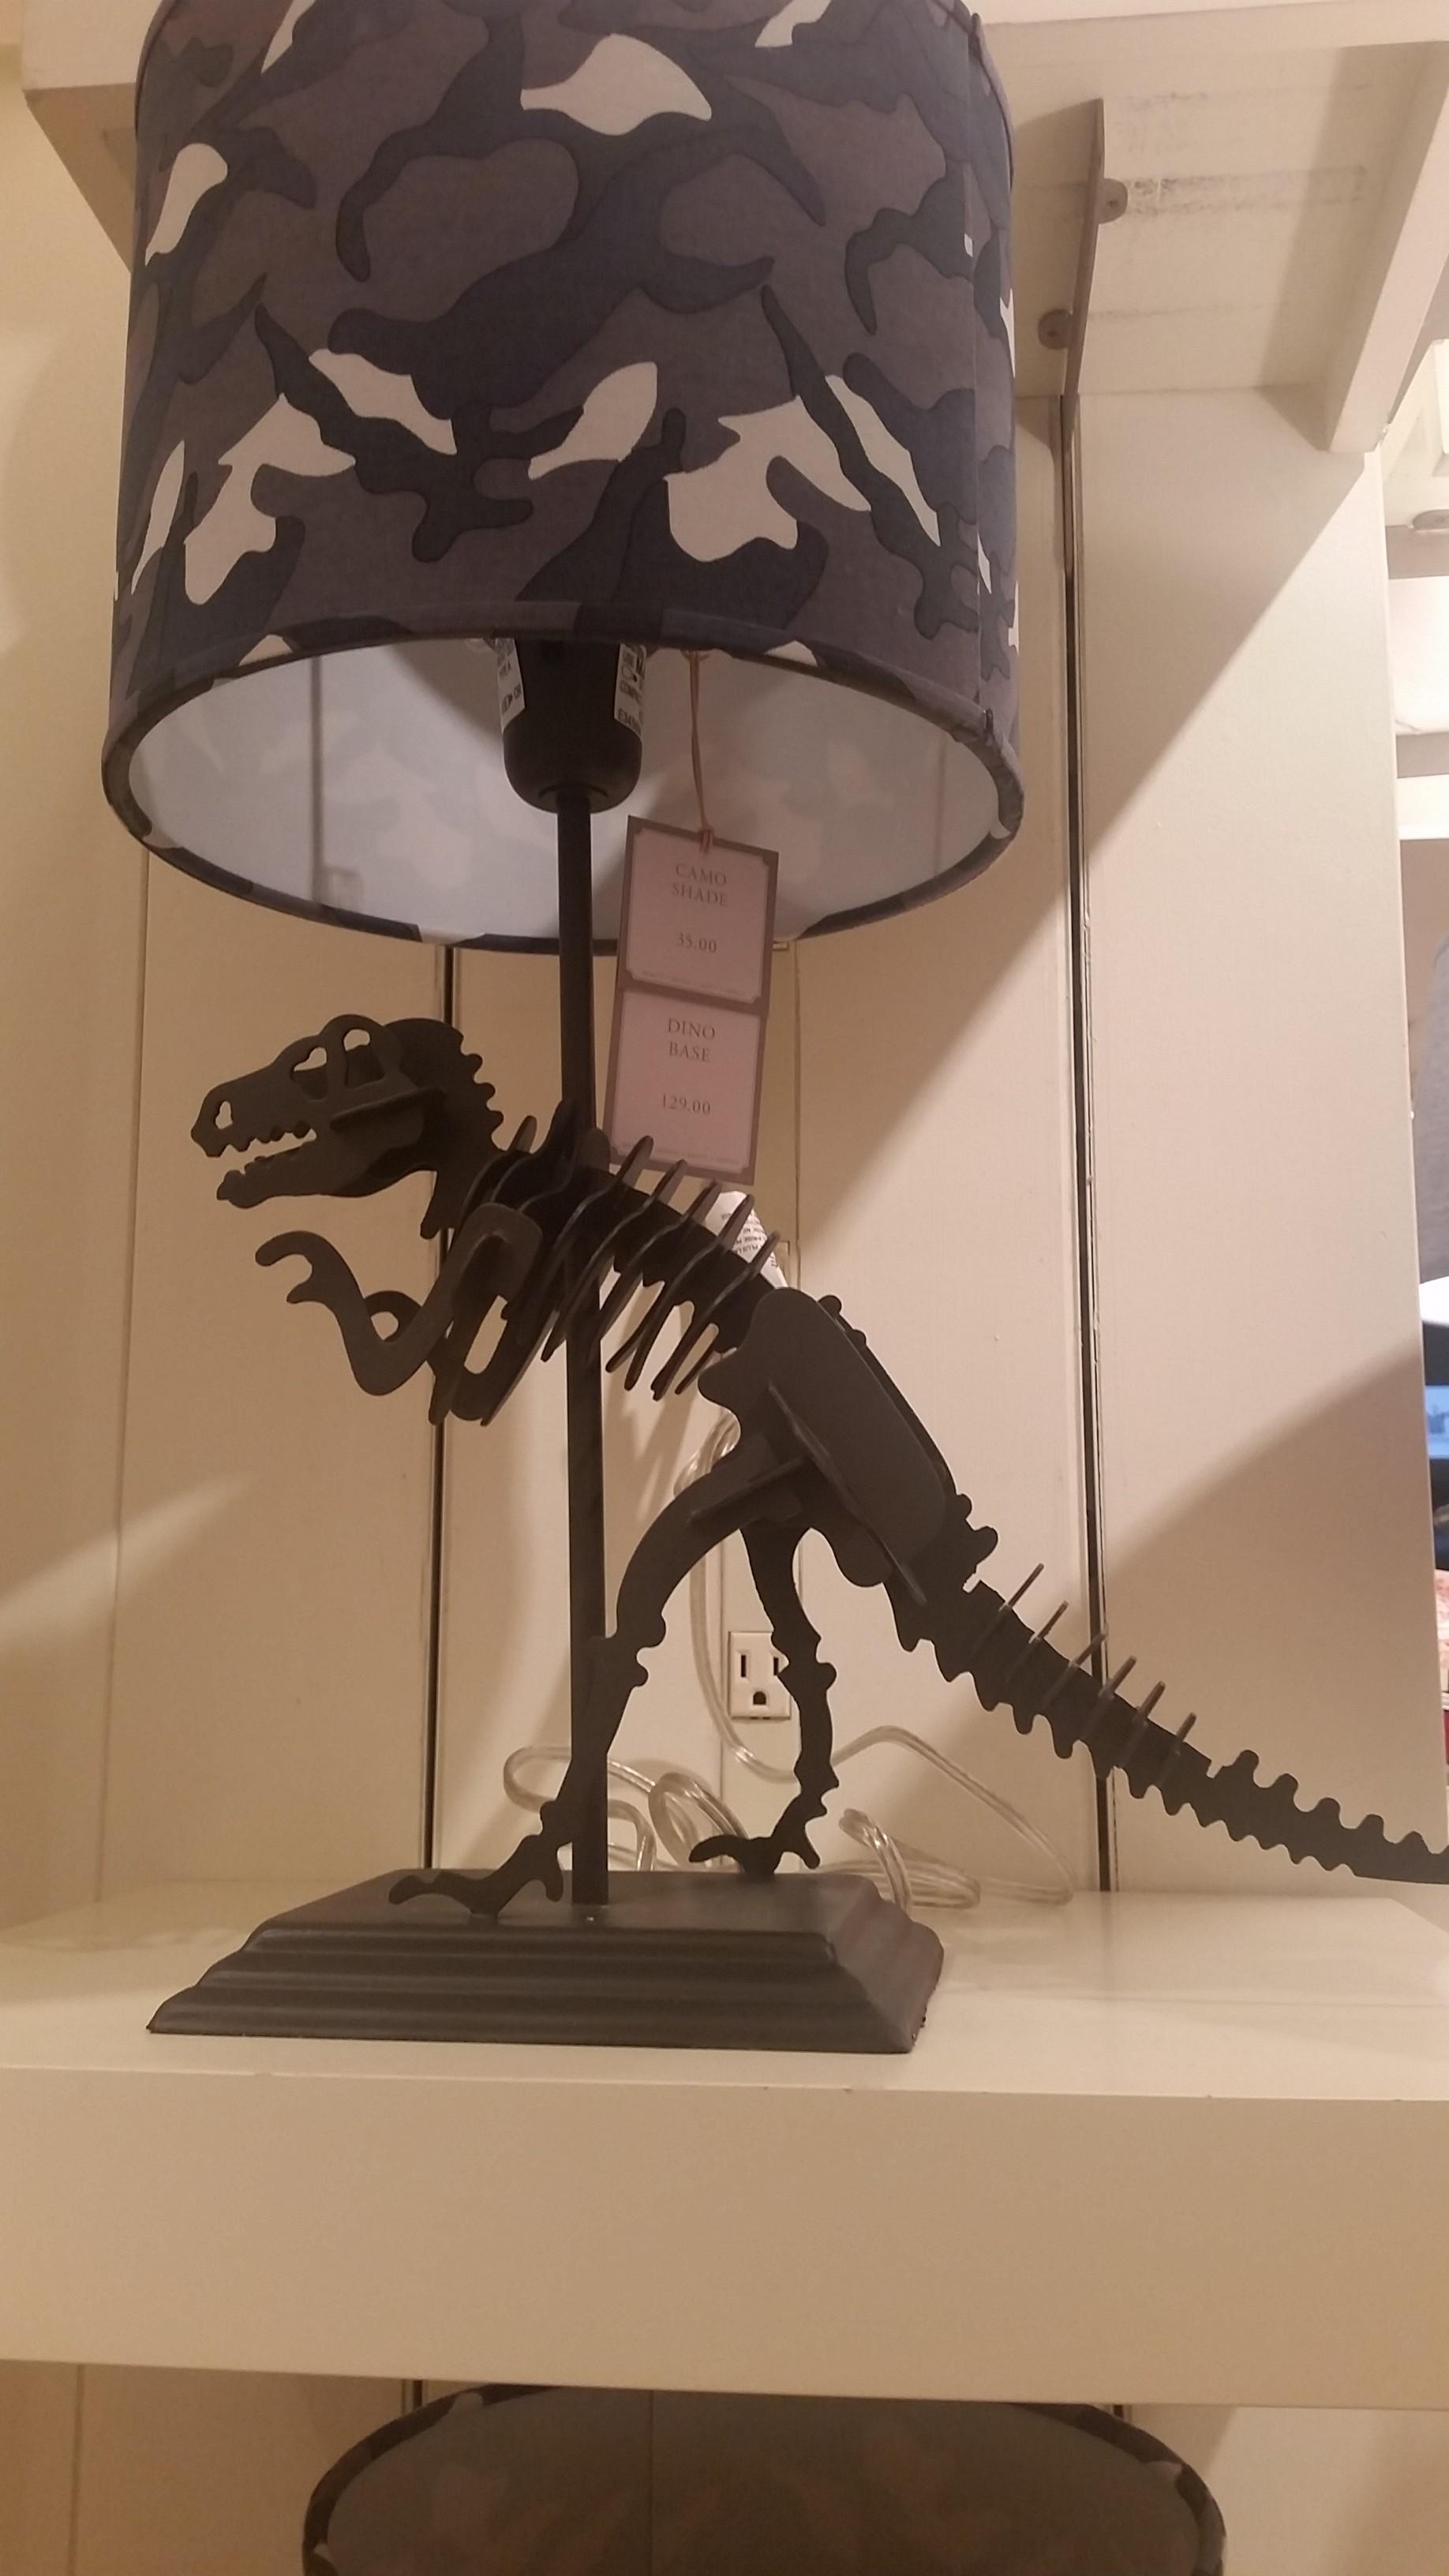 DIY Dinosaur Lamp for Less Than 30 A Grande Life